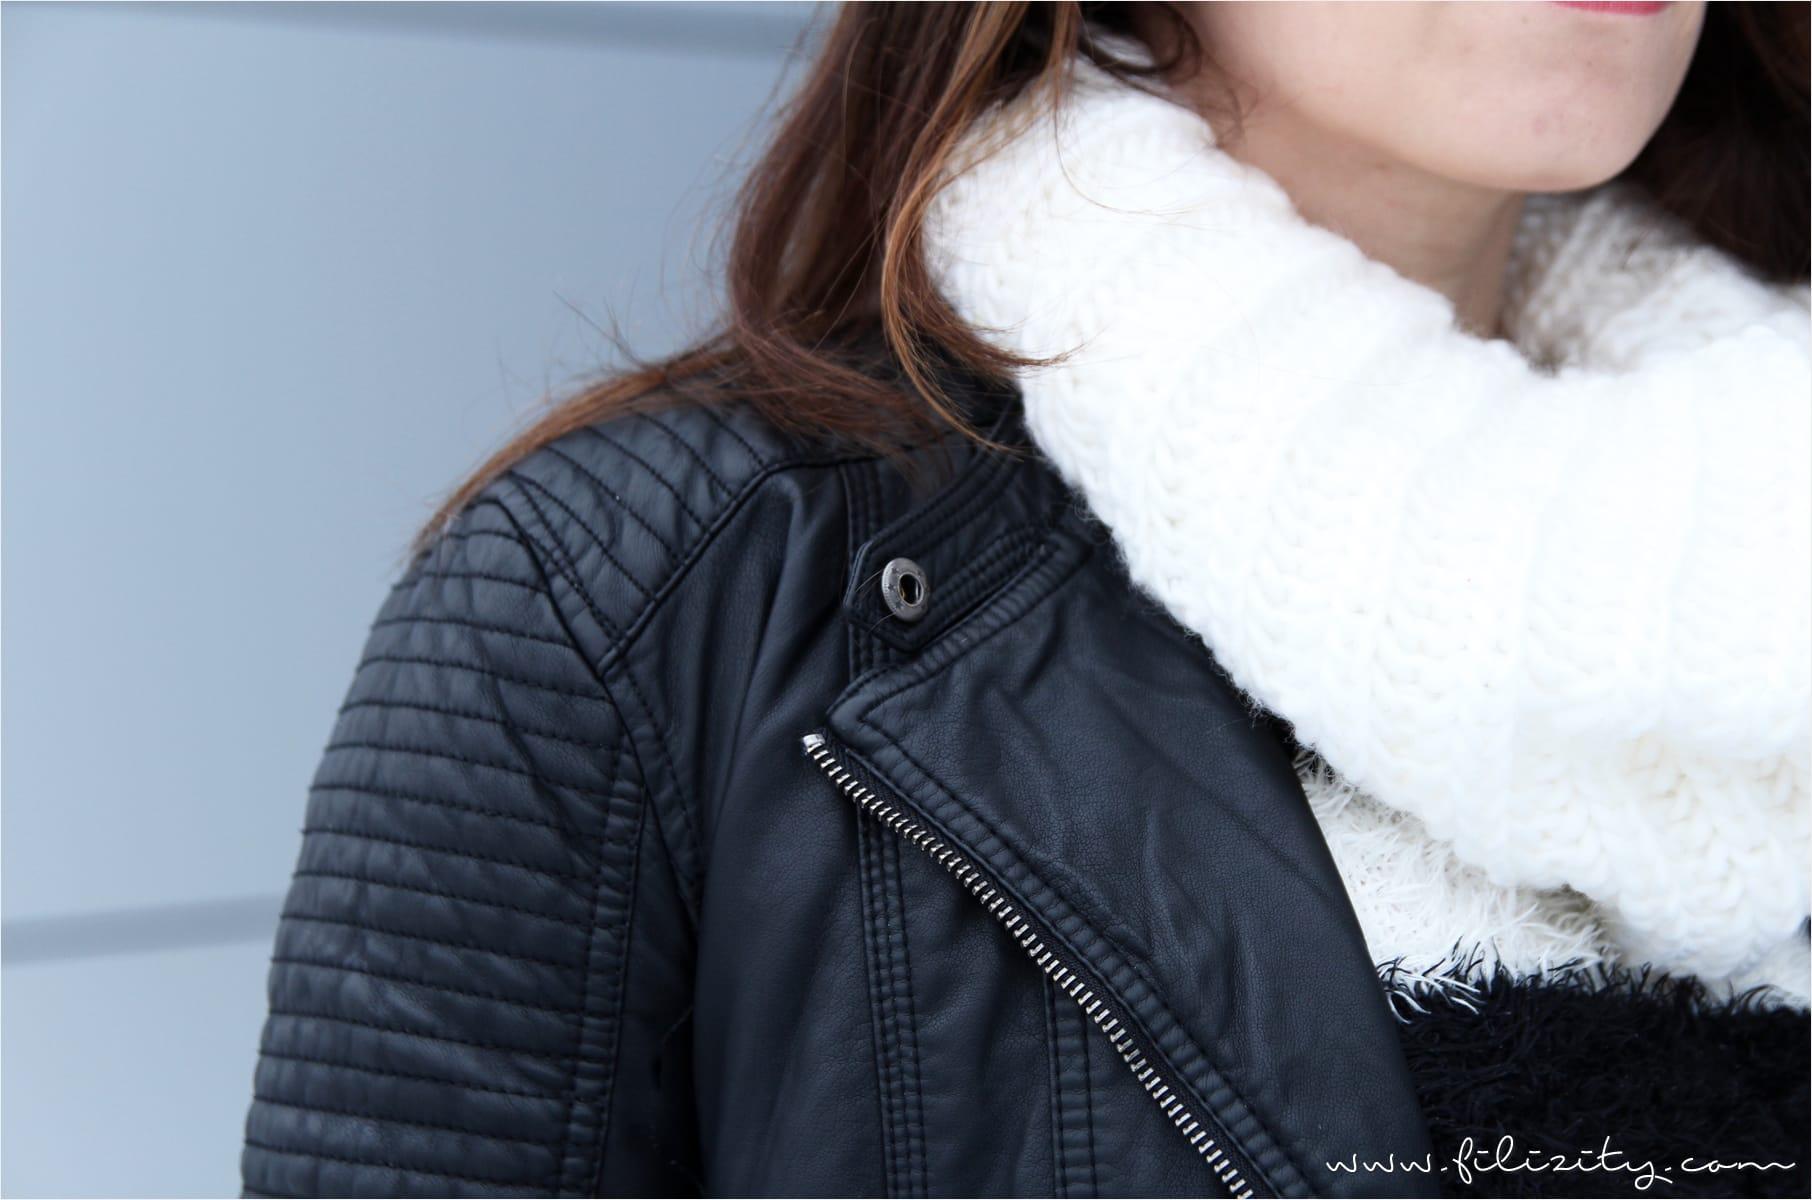 Culotte im Winter: Styling-Tipps